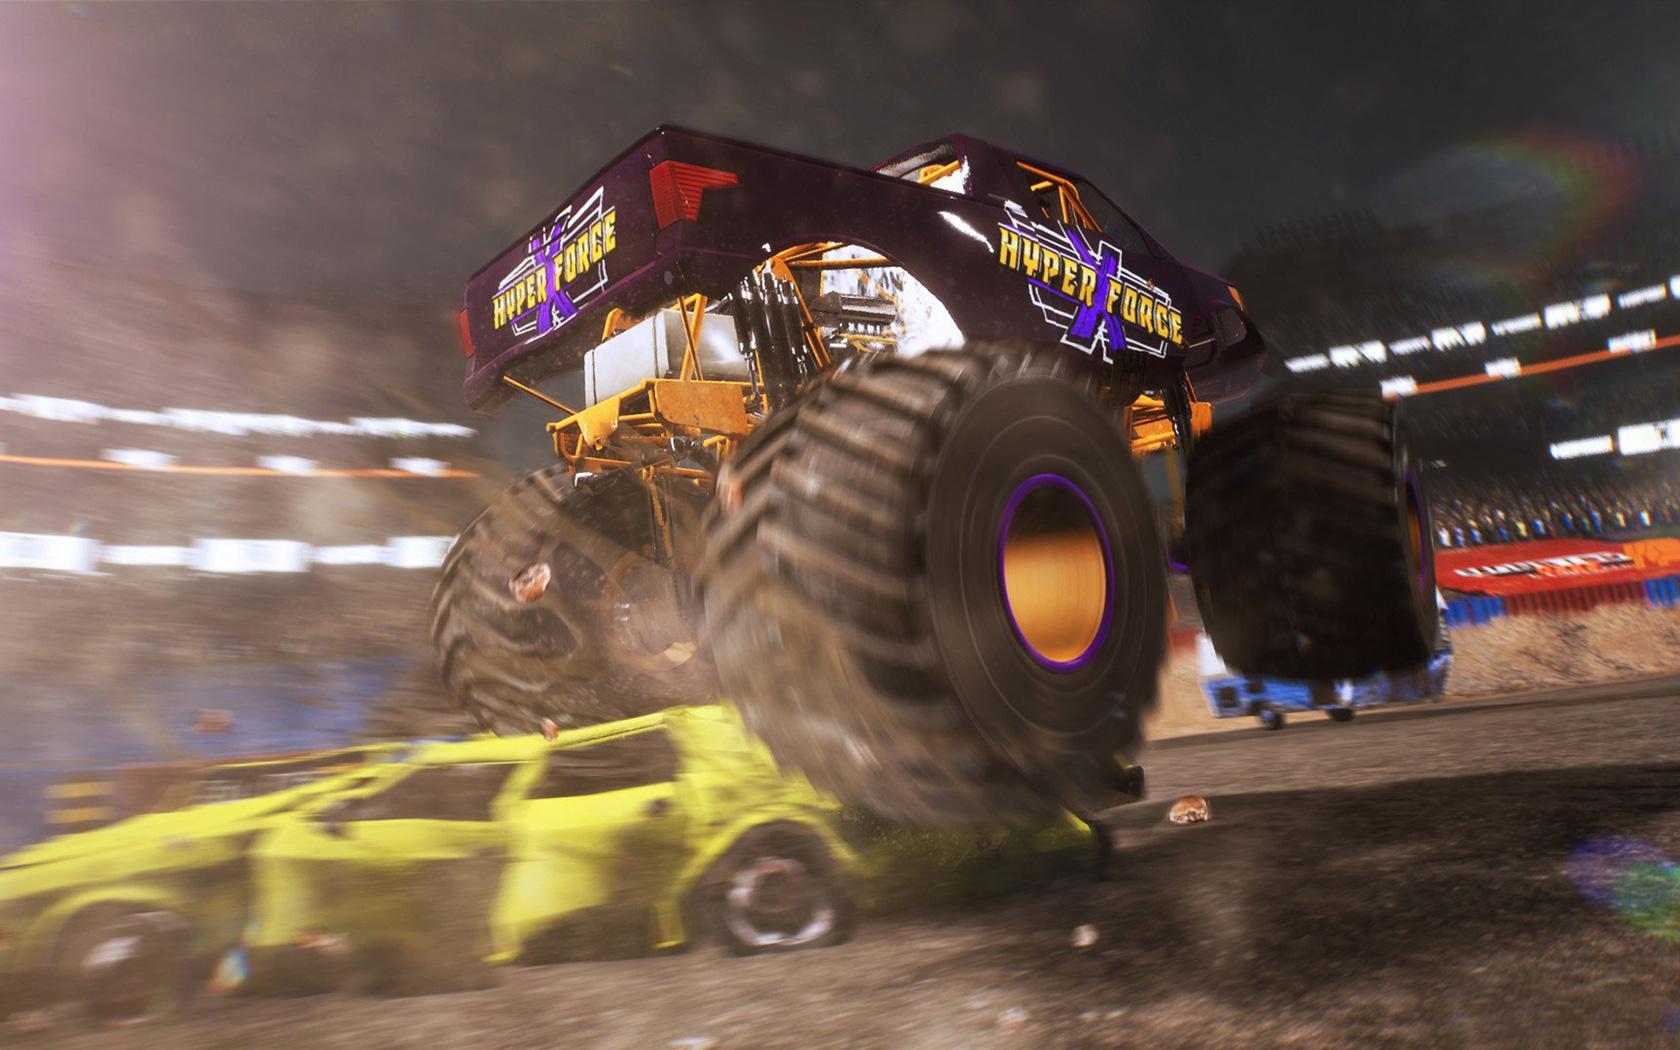 Free Monster Truck Championship Wallpaper in 1680x1050